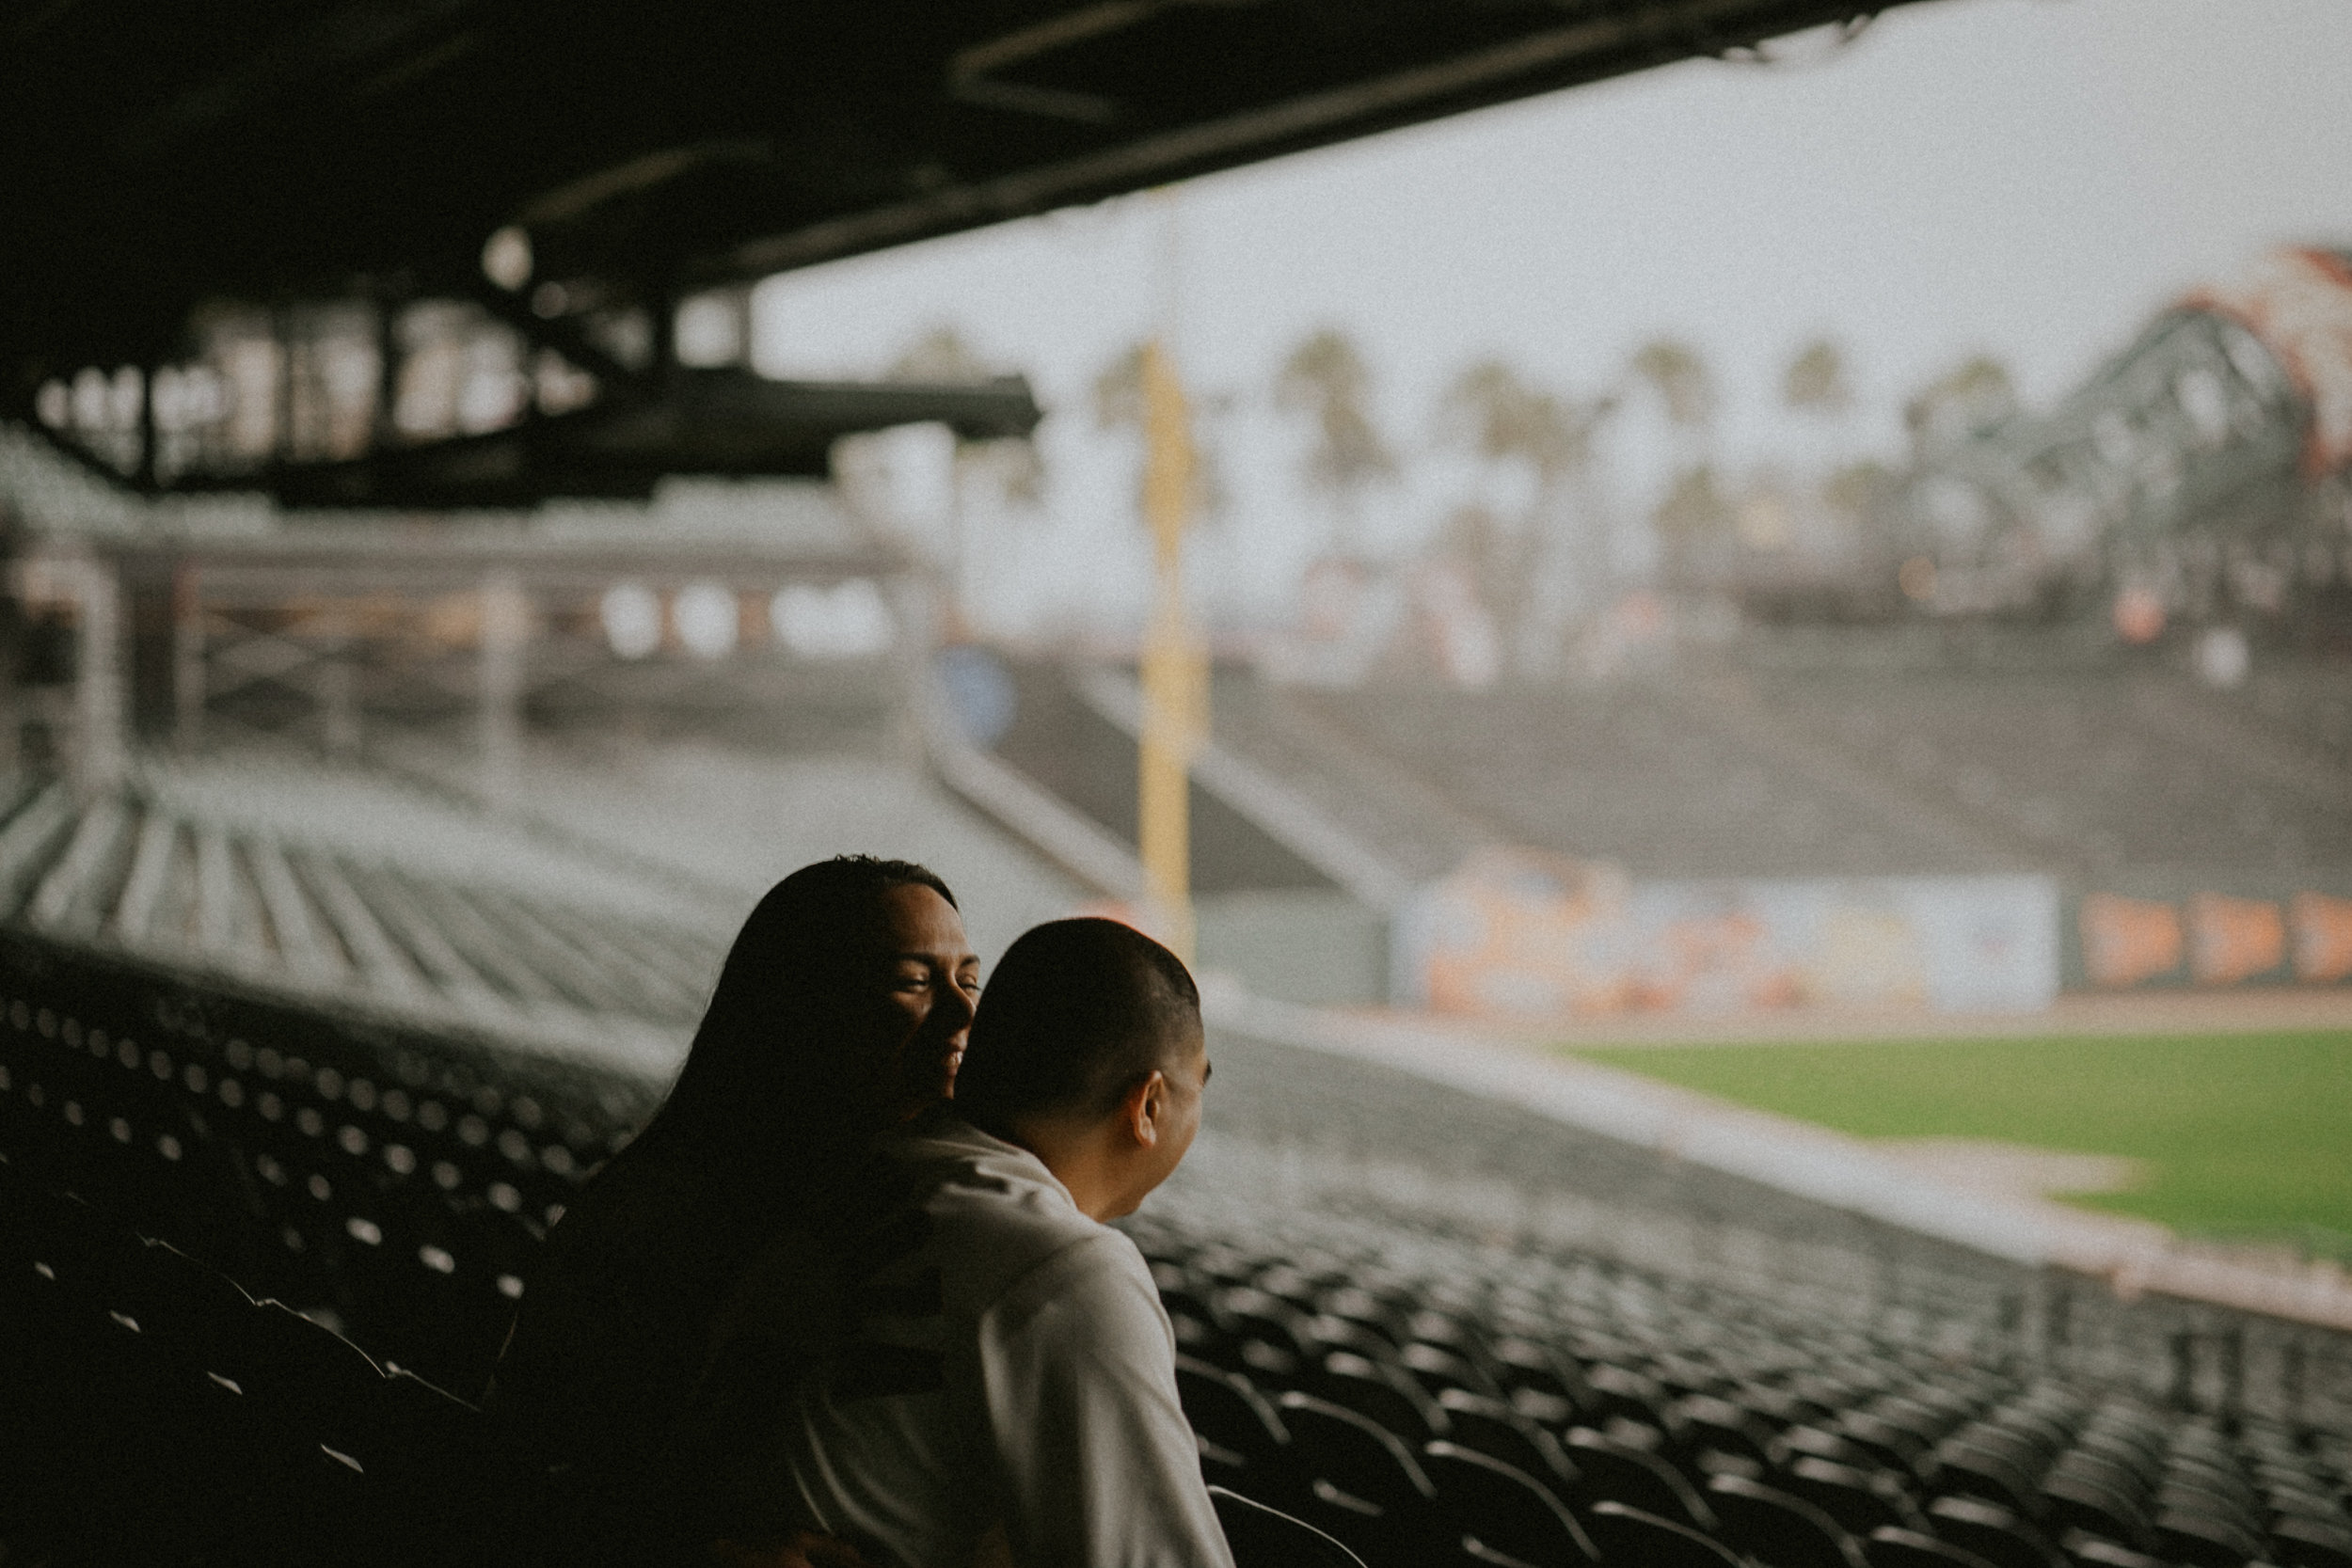 San-Francisco-engagement-wedding-photographer-Giants-AT&T-Park-6.jpg